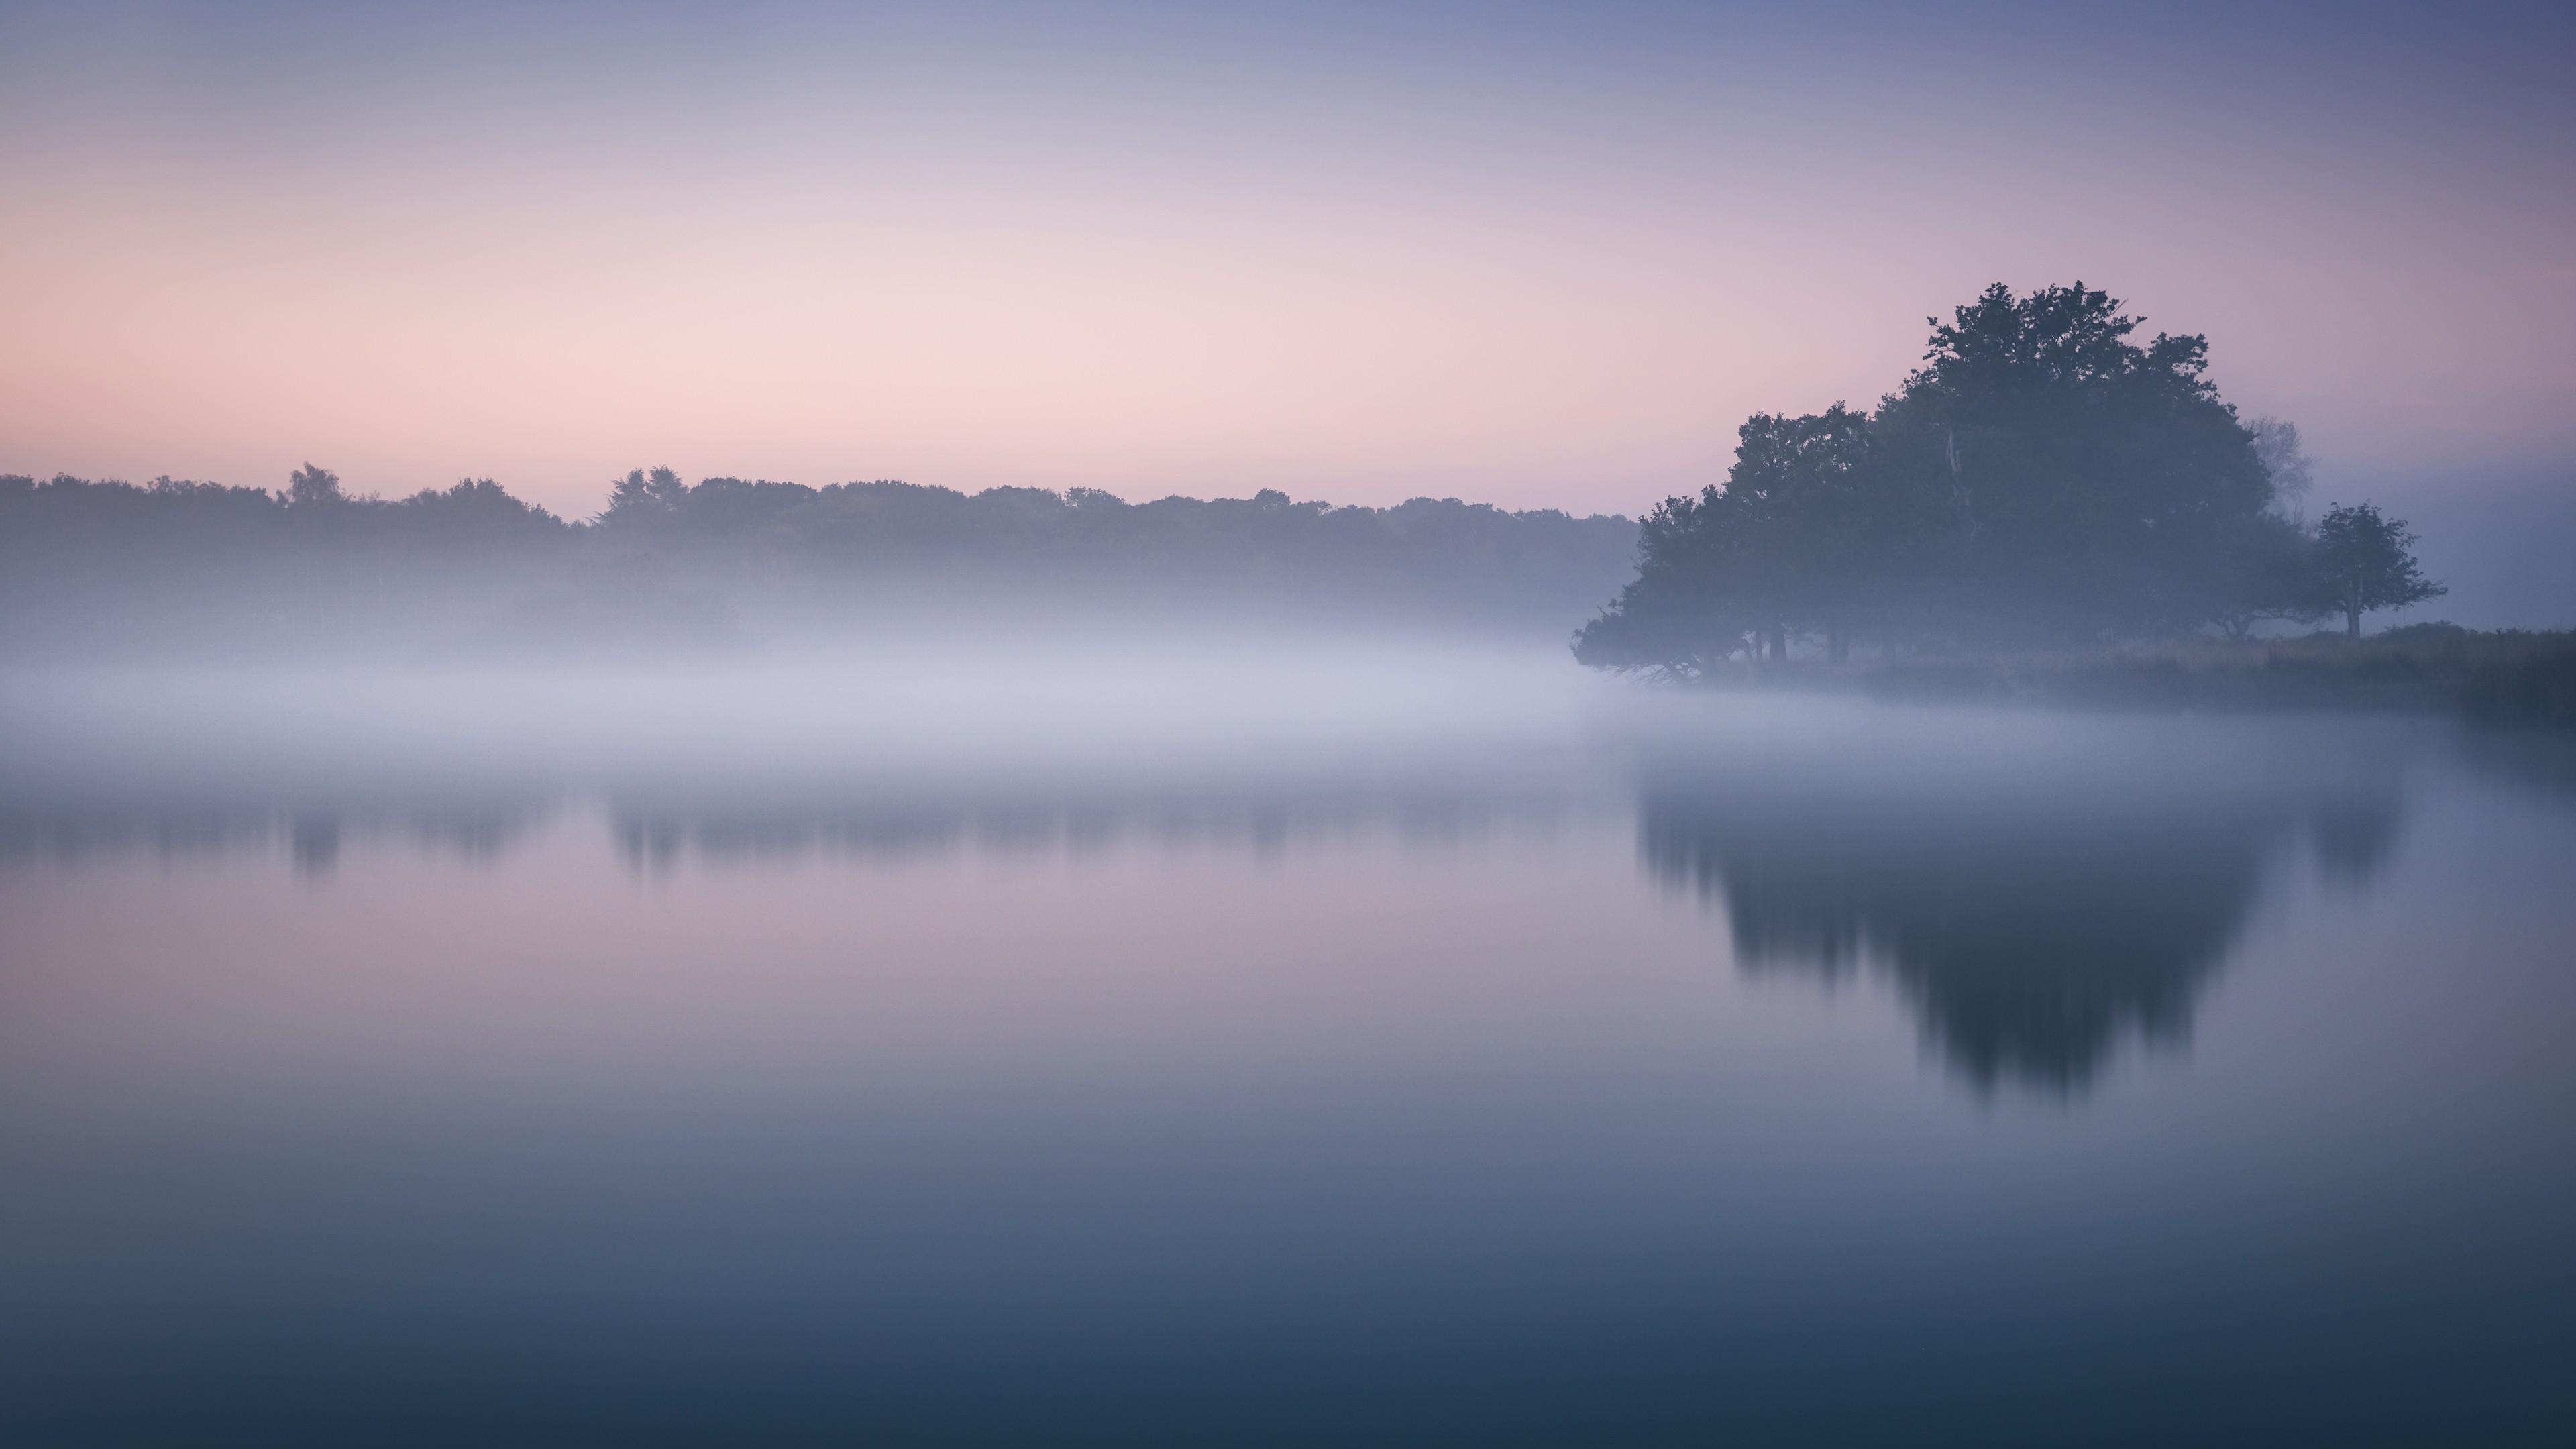 Голубая рассветная дымка тумана над речной гладью